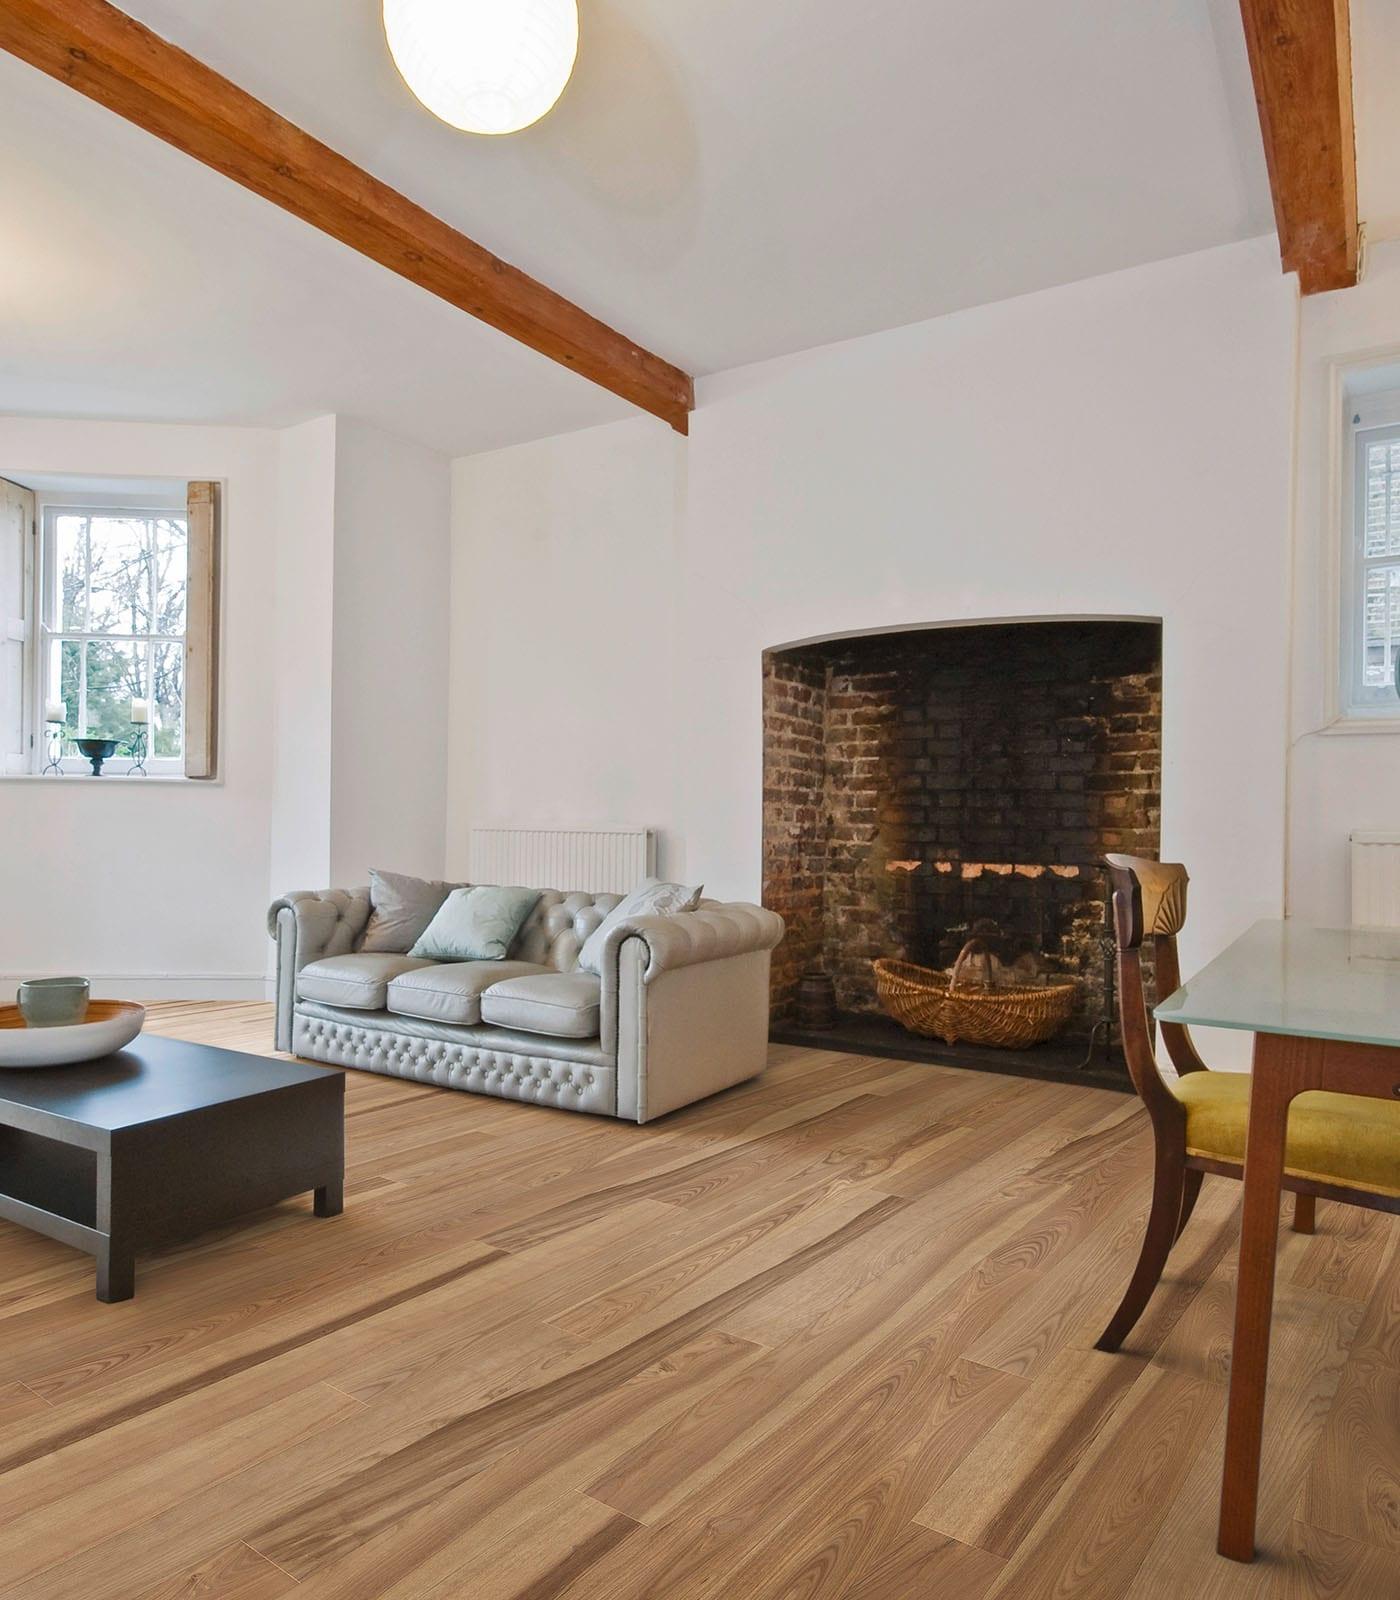 St Petersberg-engineered European Ash hardwood flooring